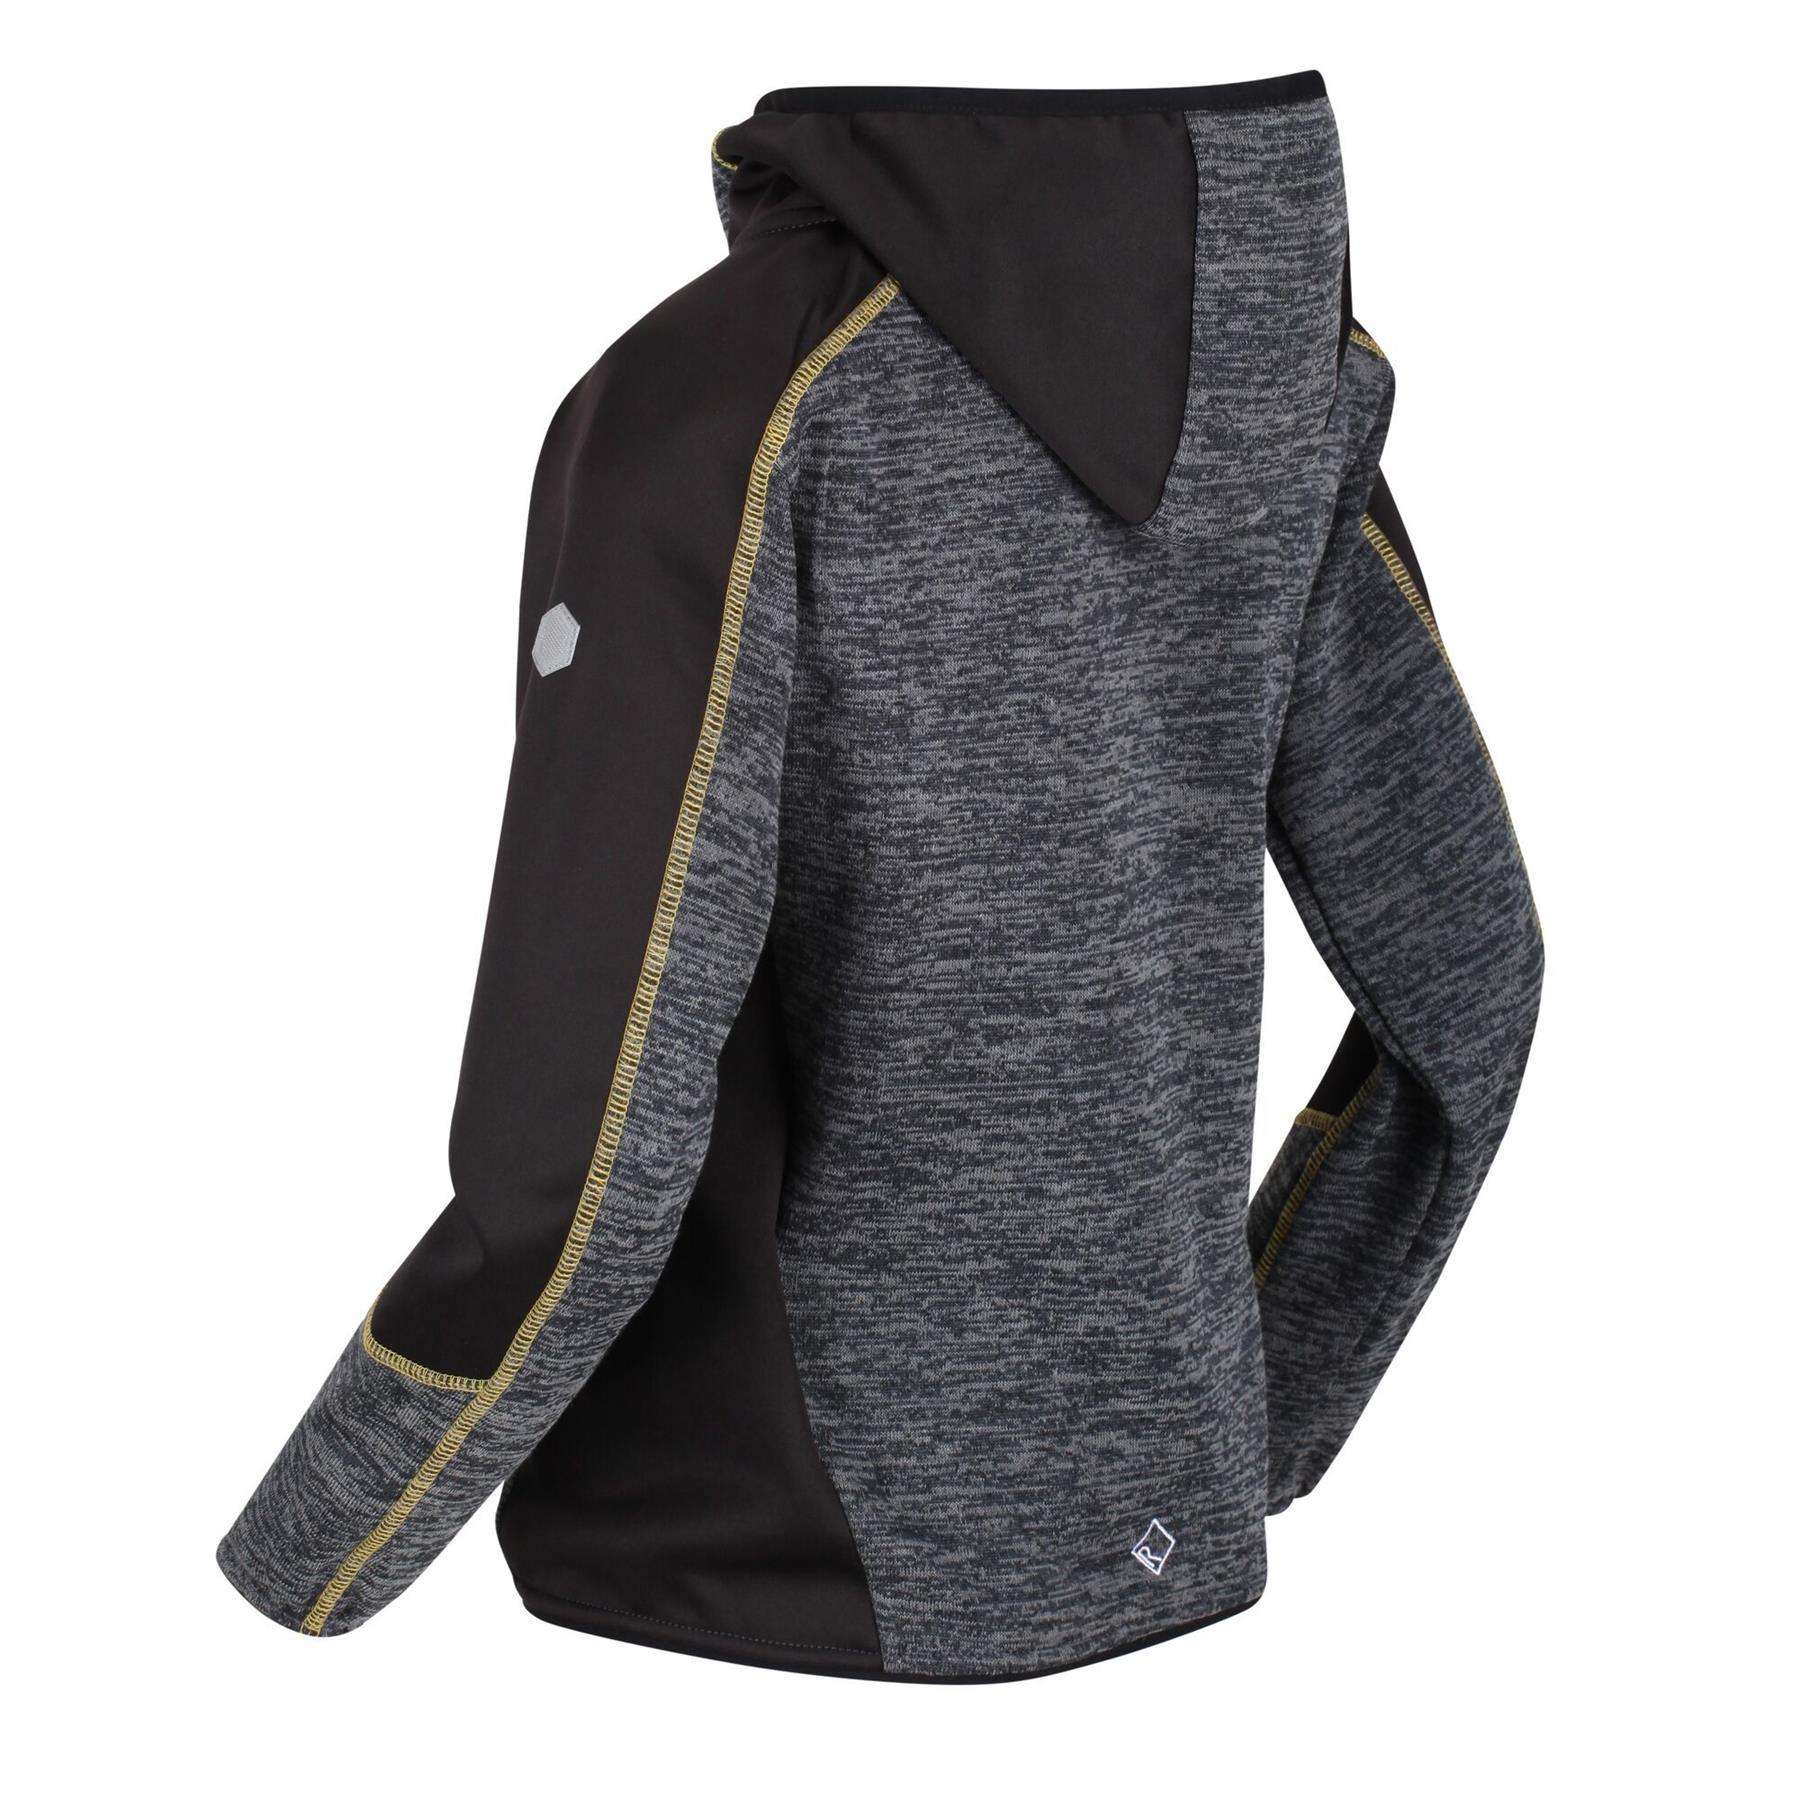 miniatuur 8 - Regatta Kids Dissolver III Full Zip Insulated Fleece Jacket Hoodie Boys Girls